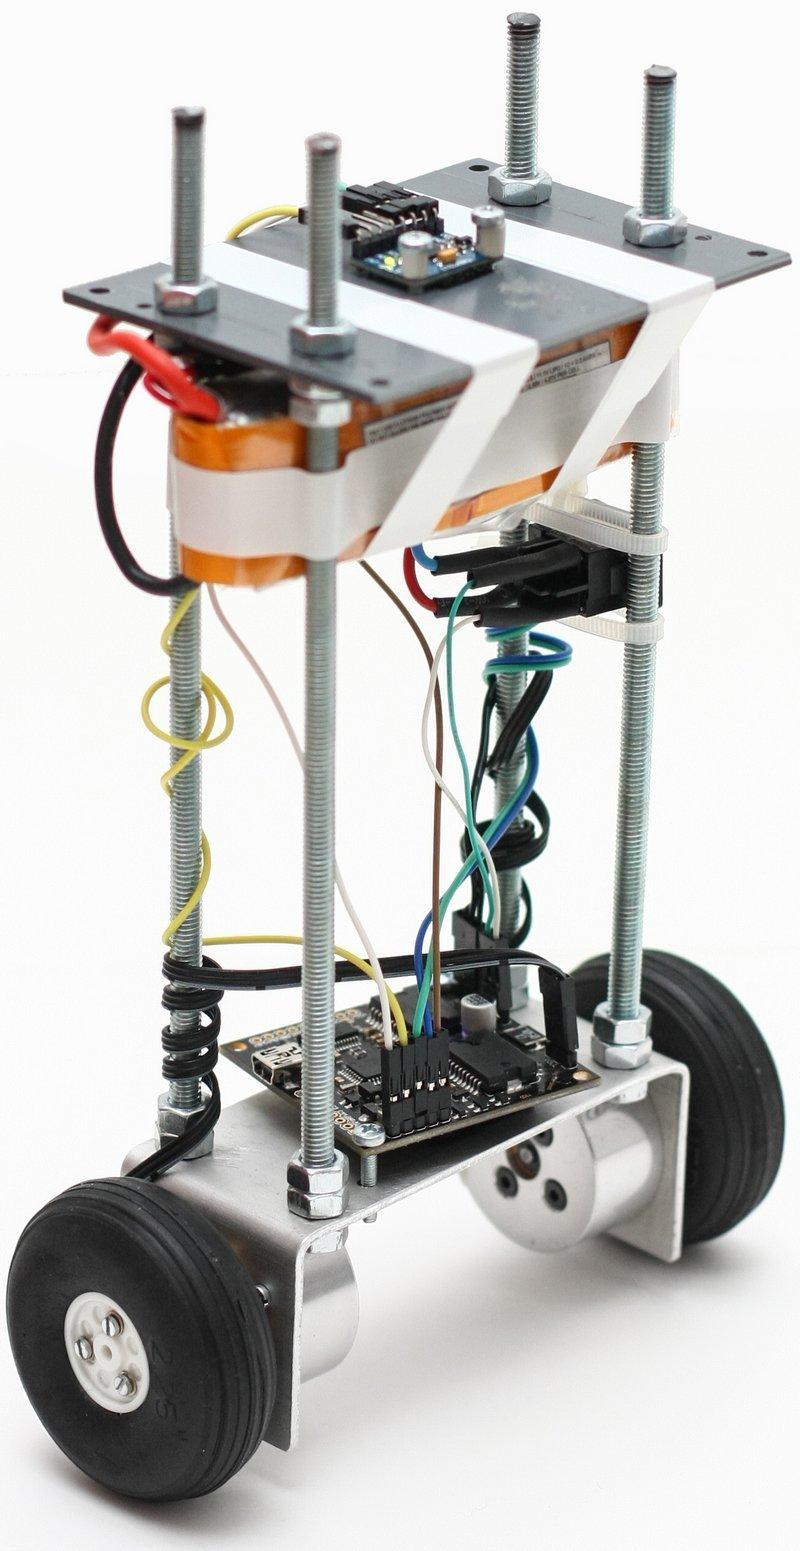 mobil-robot-accelerometer-inverse-pendulum-i2c-bus-modeling-simulation-matlab-simulink-mpu605